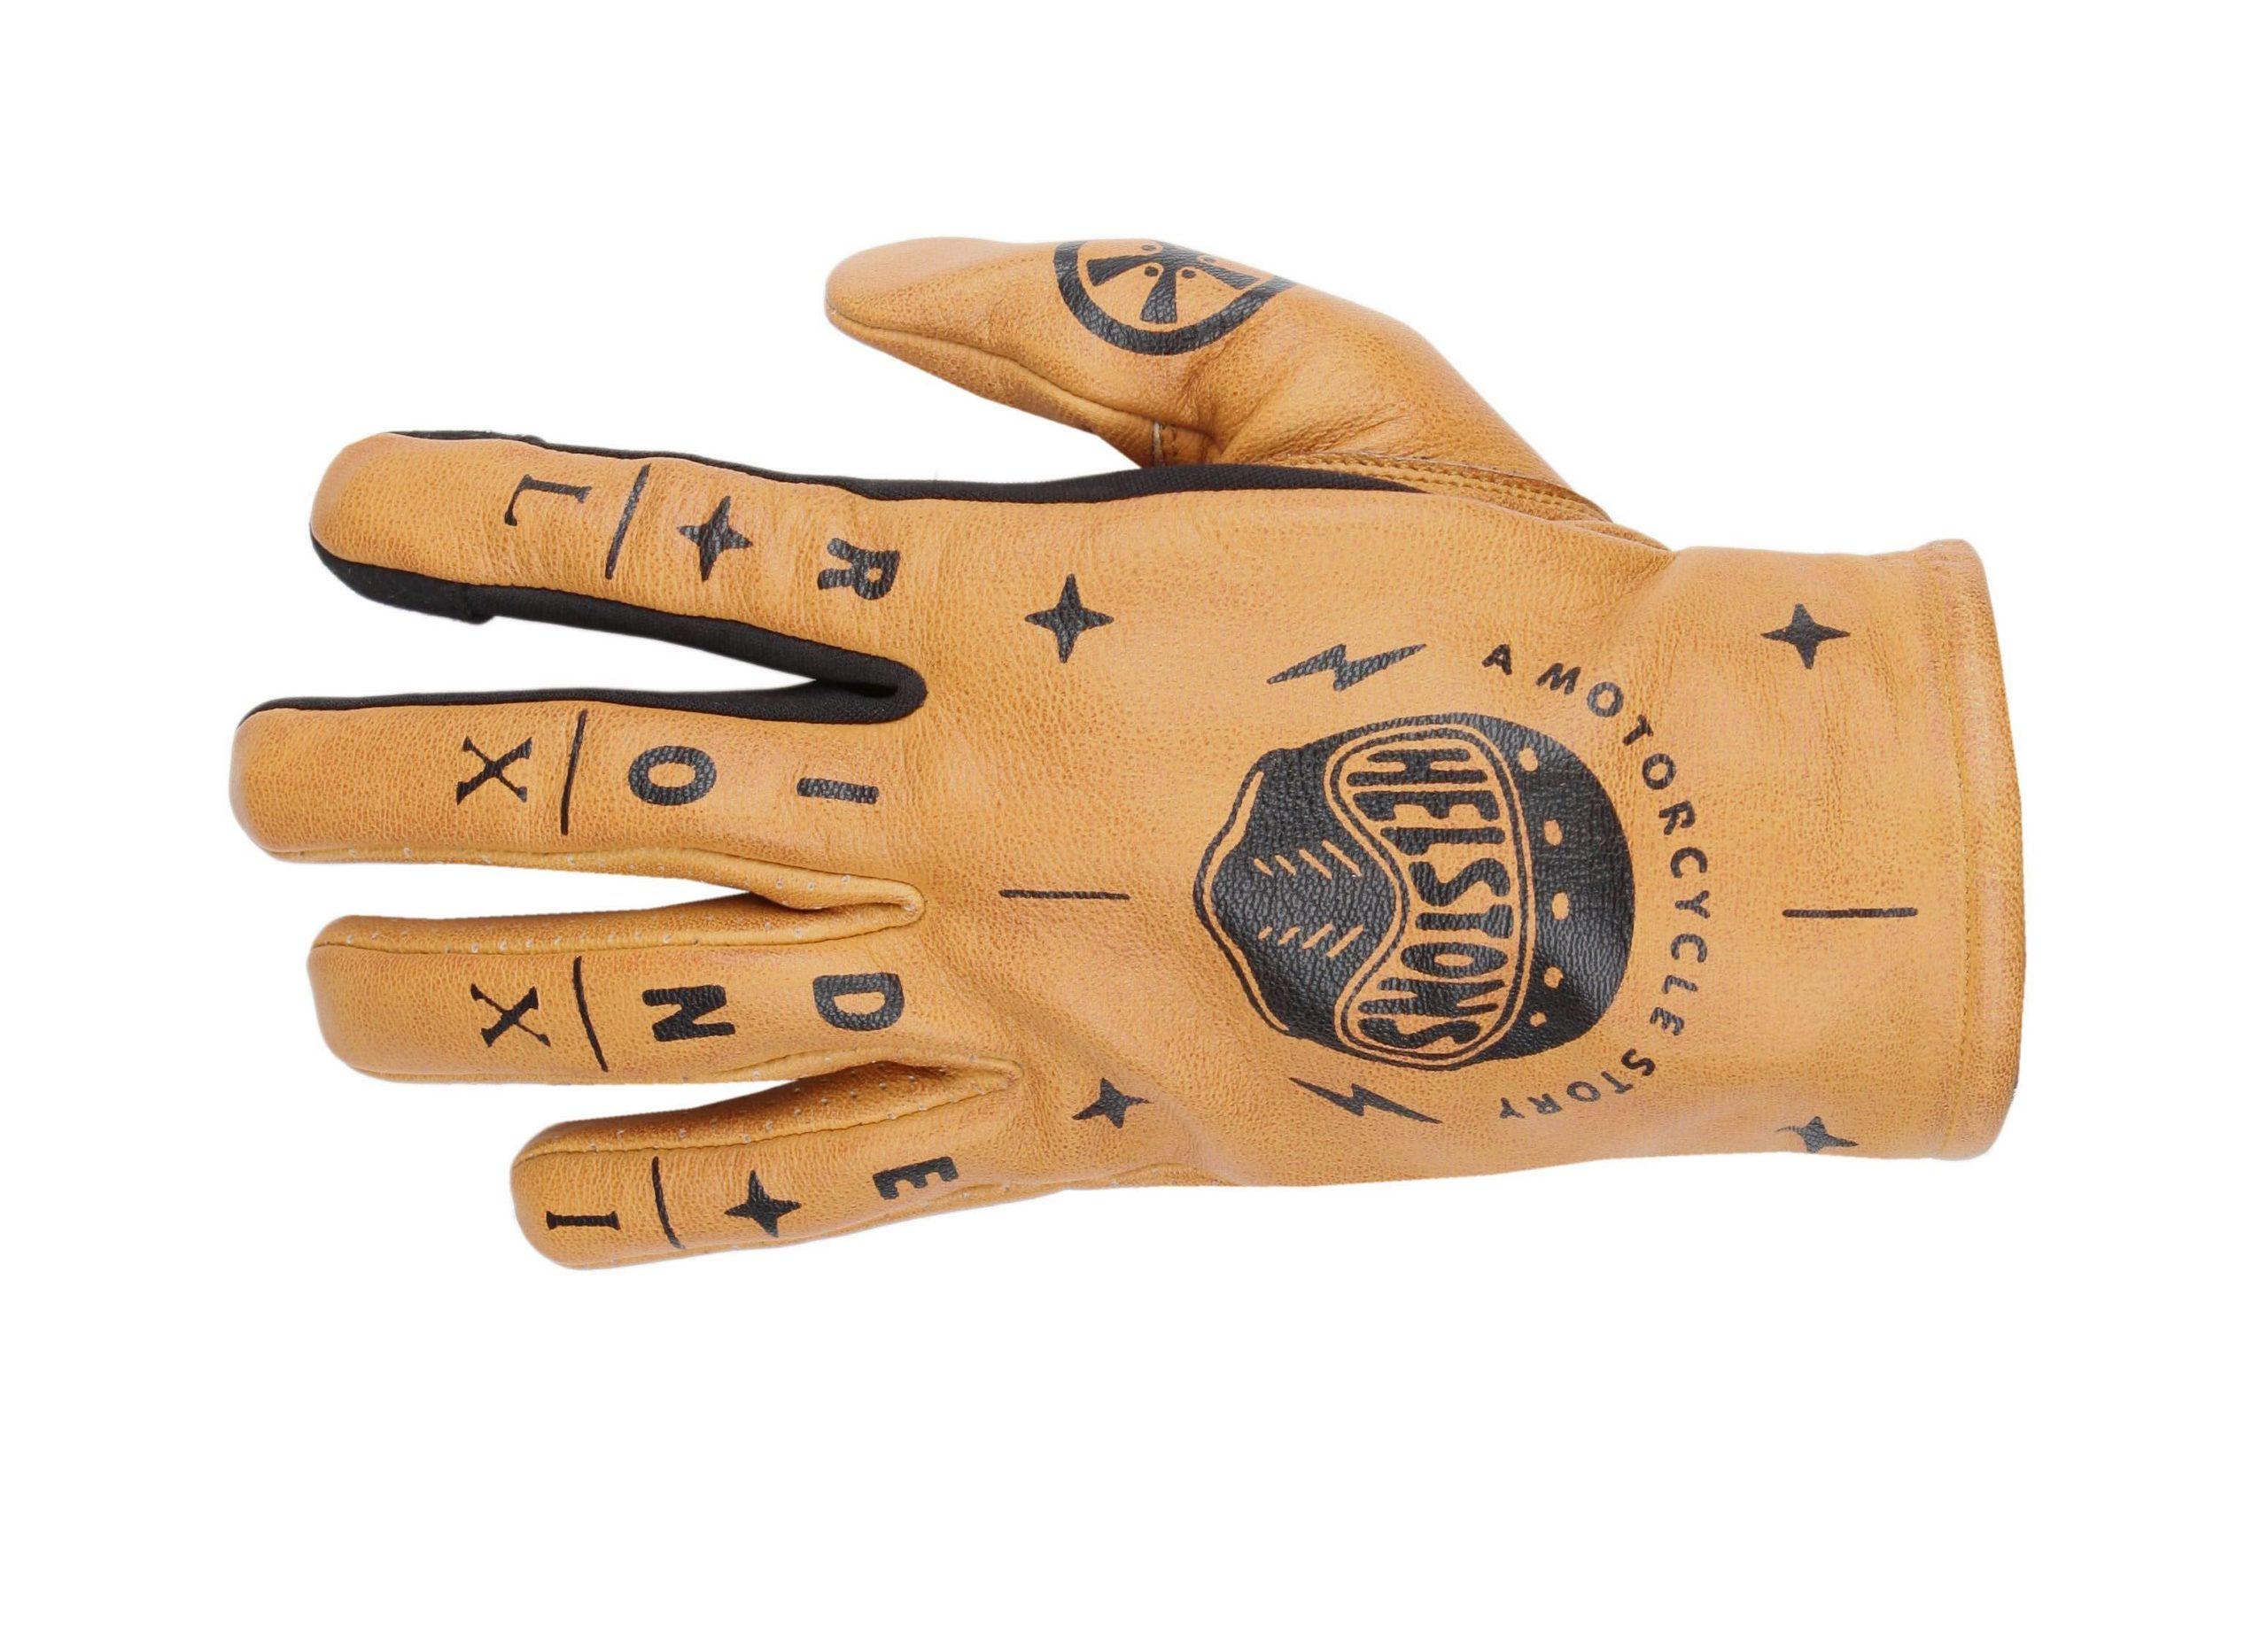 Helstons, KUSTOM, gants, tattoo, lappoms, lifestyle blog